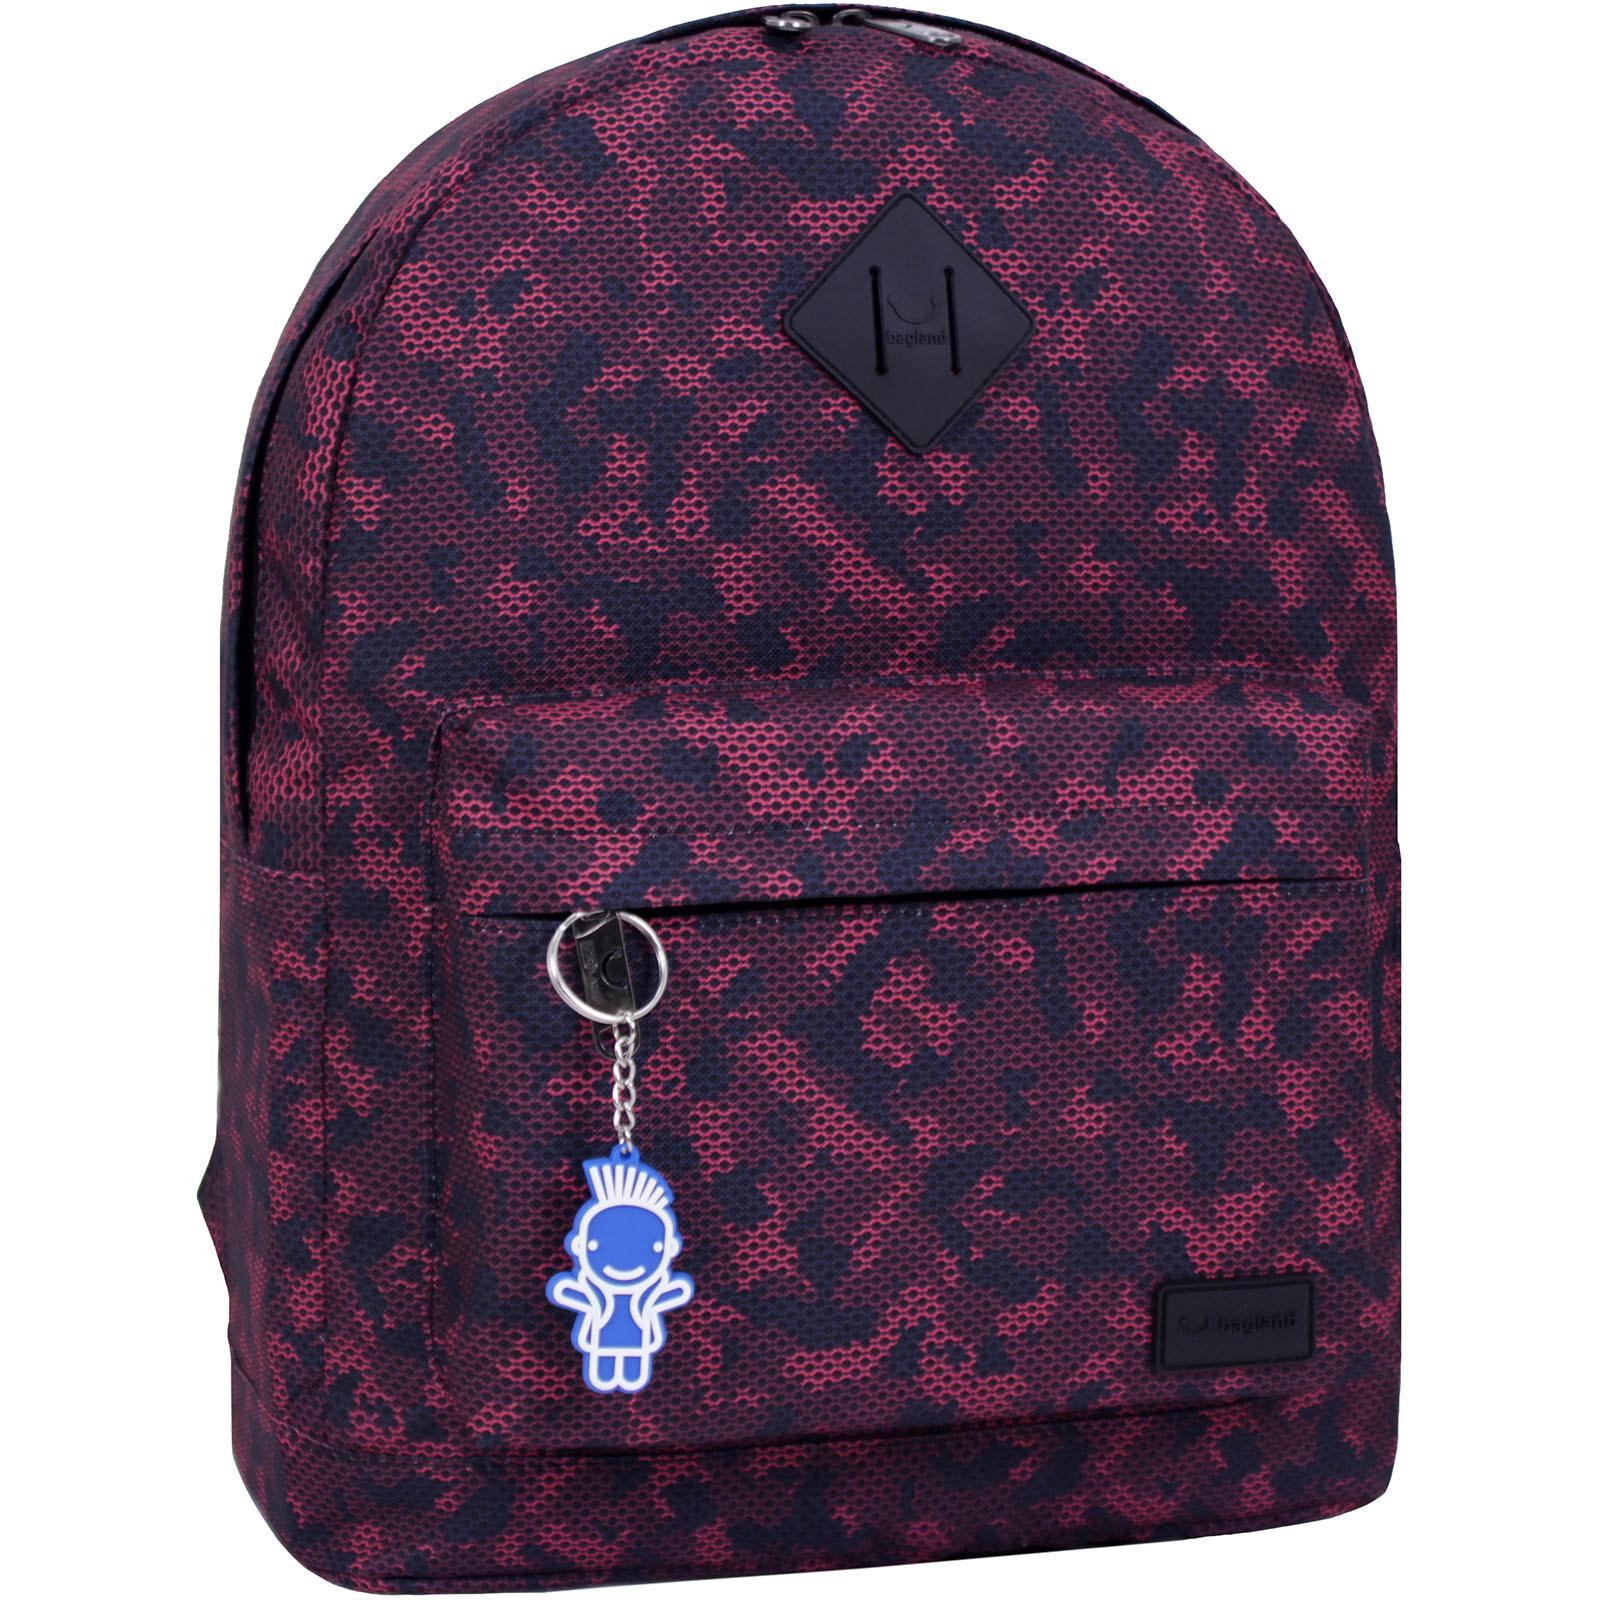 Городские рюкзаки Рюкзак Bagland Молодежный (дизайн) 17 л. сублімація 466 (00533664) IMG_3626_суб.466_.JPG